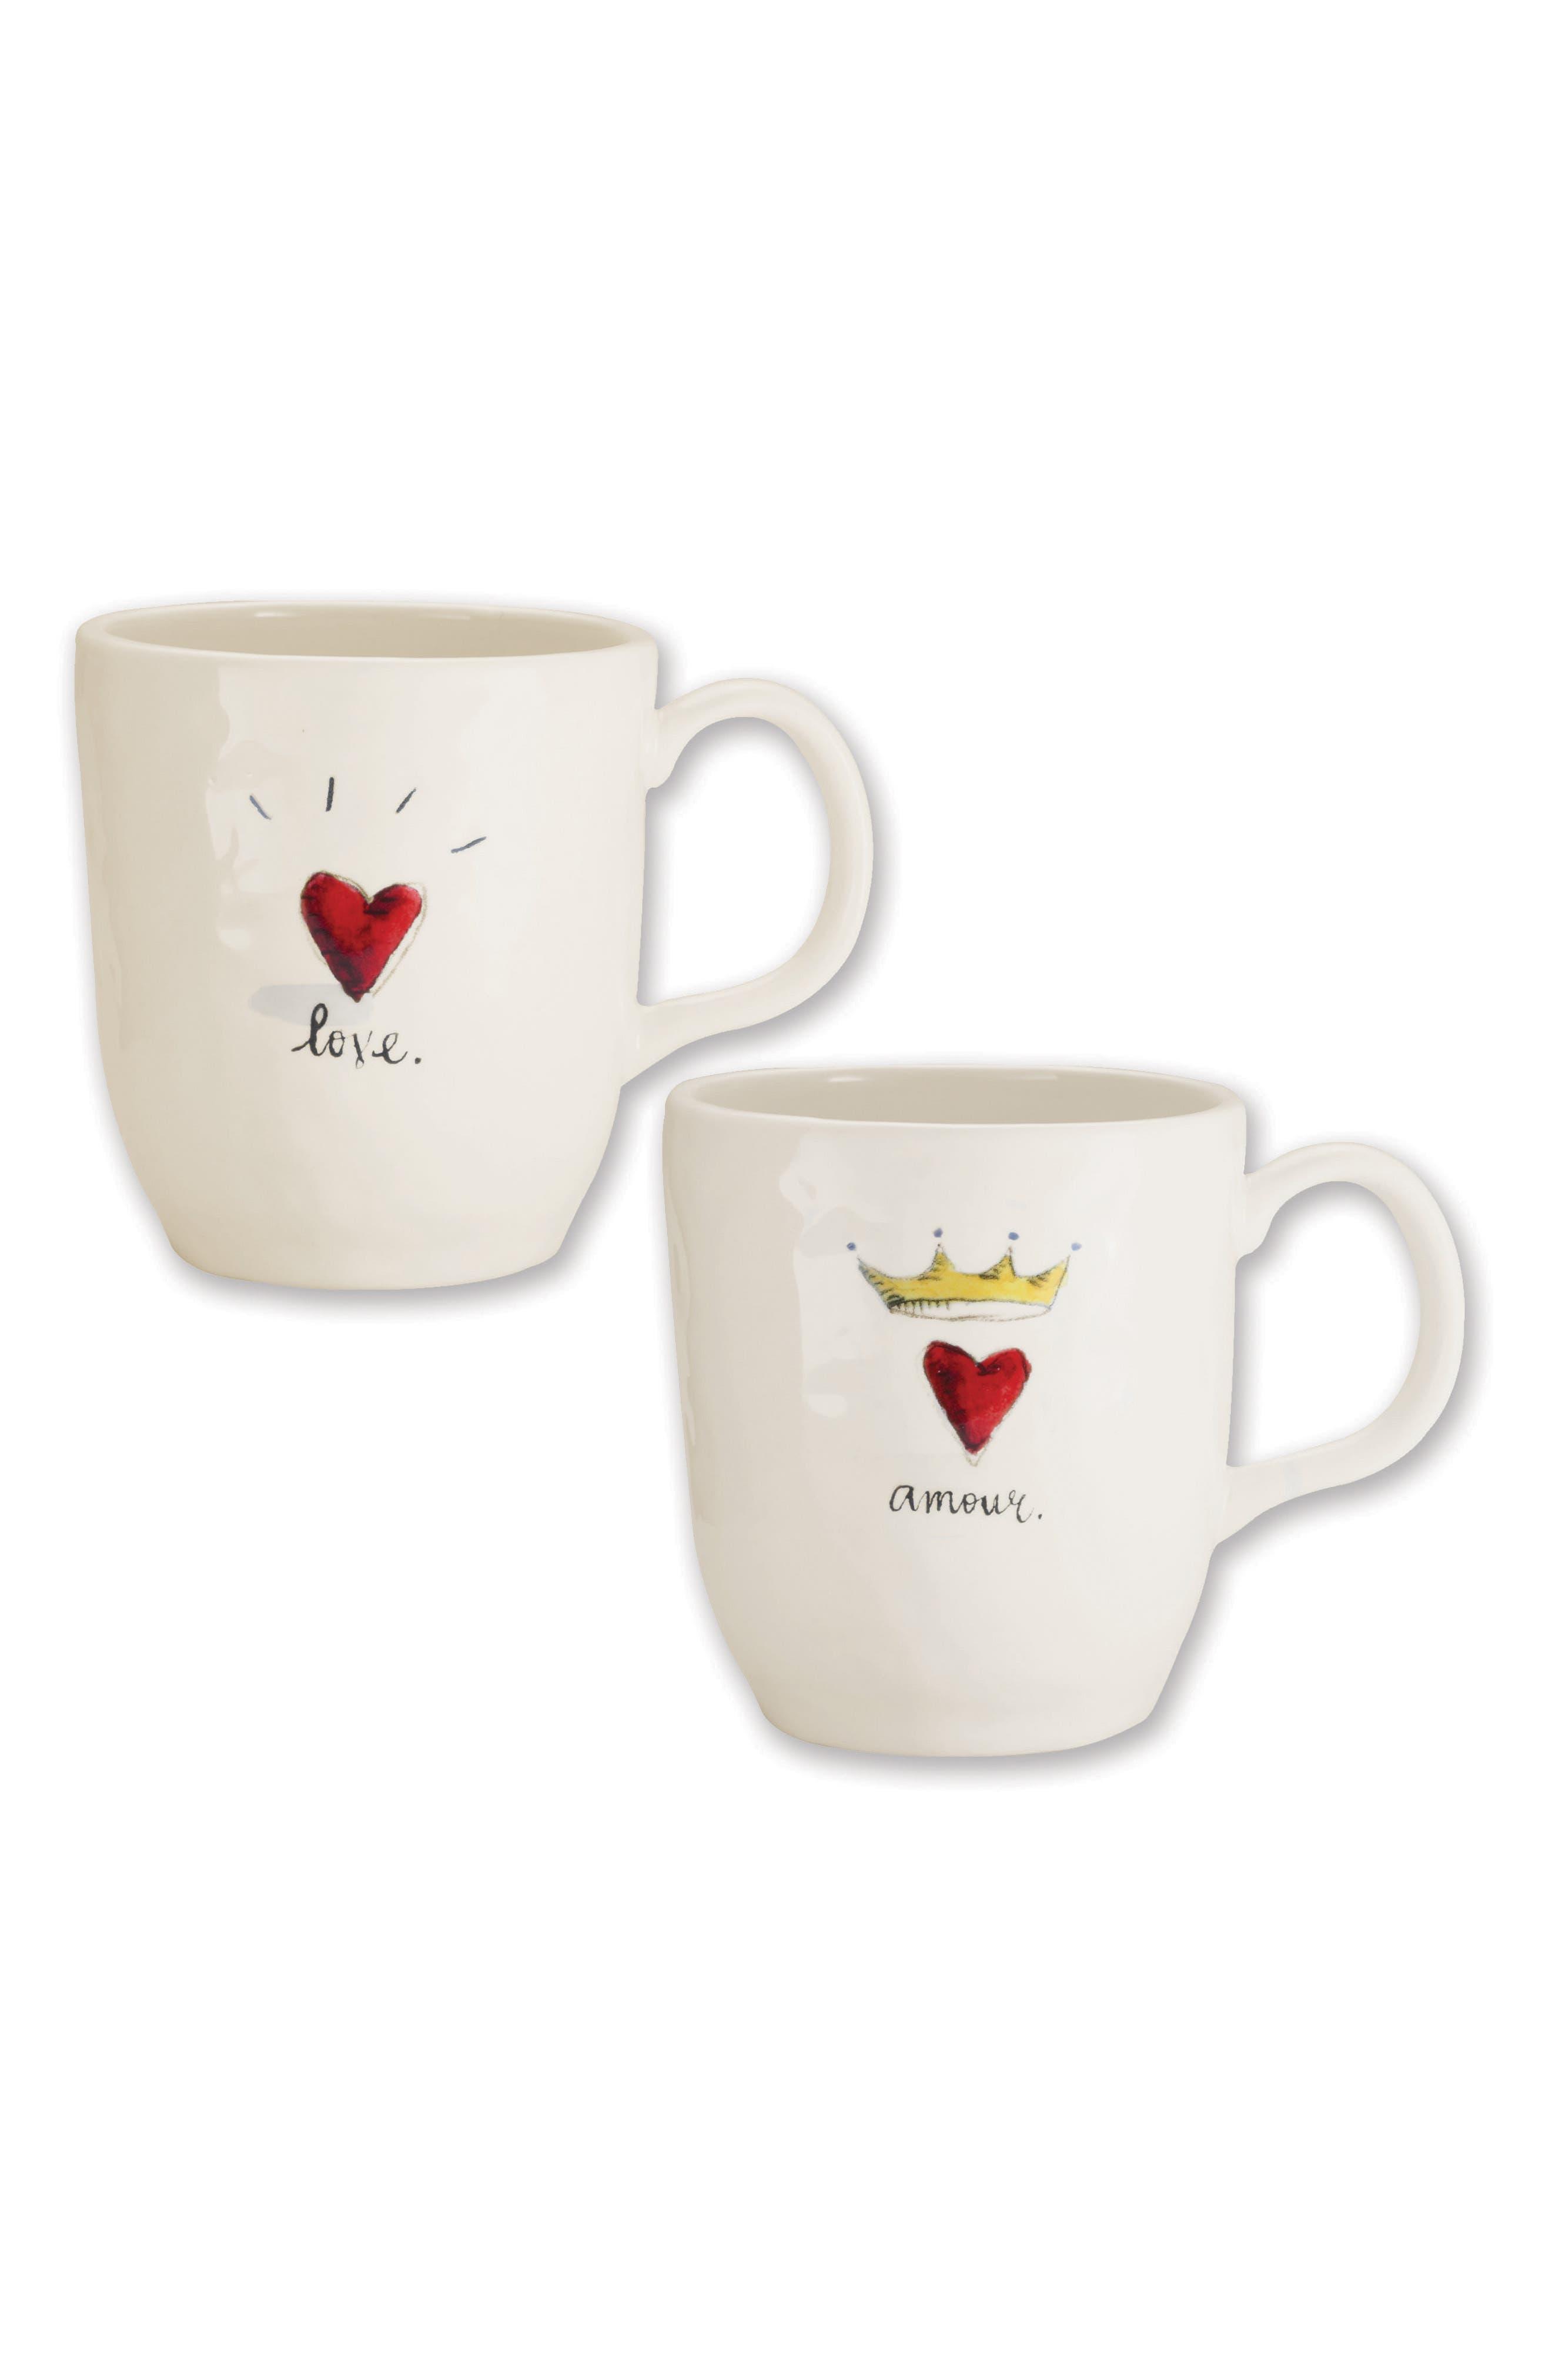 Alternate Image 1 Selected - Rae Dunn Love & Amour Set of 2 Ceramic Mugs